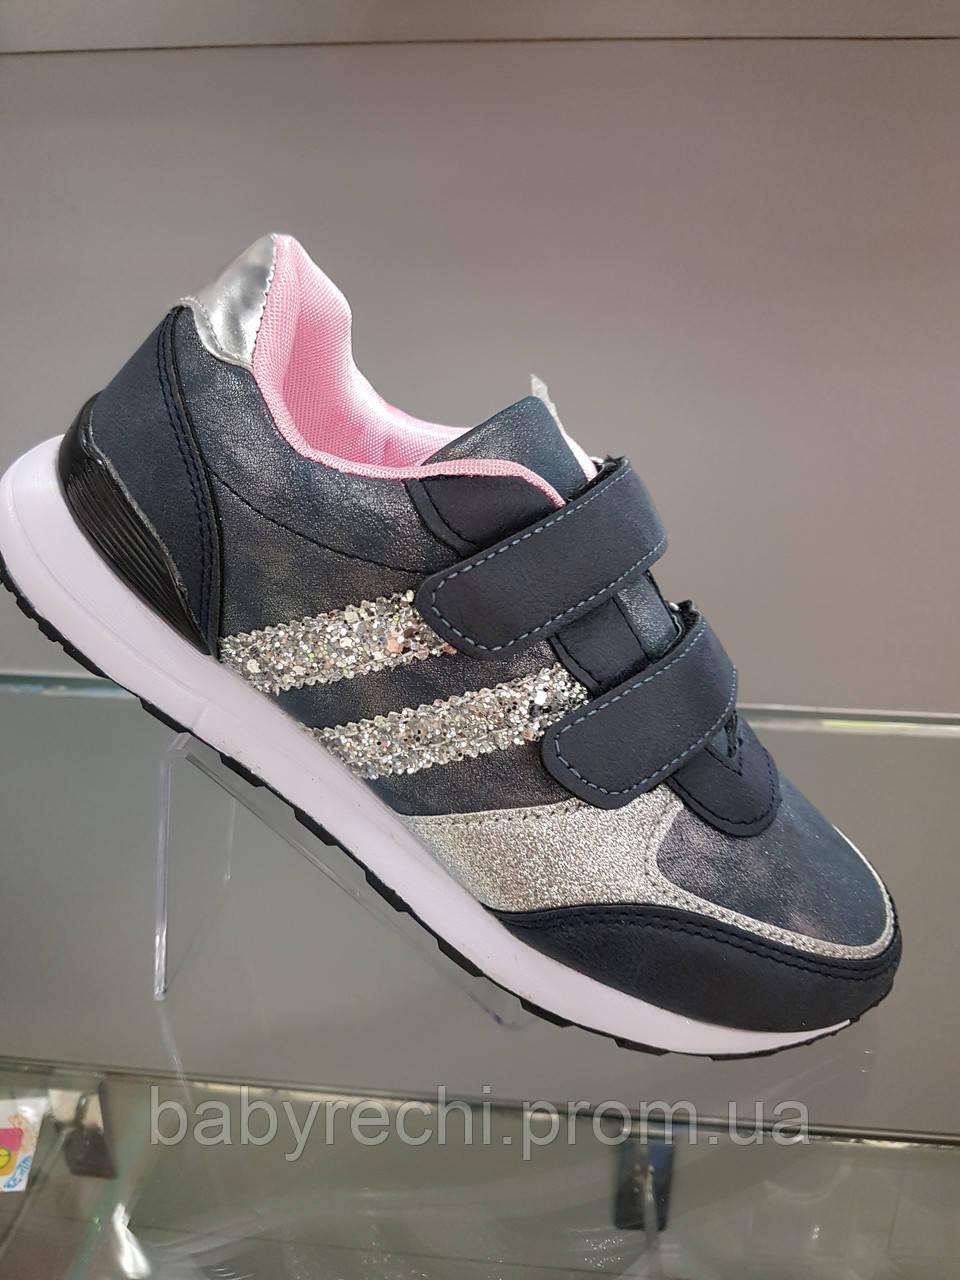 aa38e07e Детские серые с розовым кроссовки для девочки Tom.m 33-38, цена 330 ...